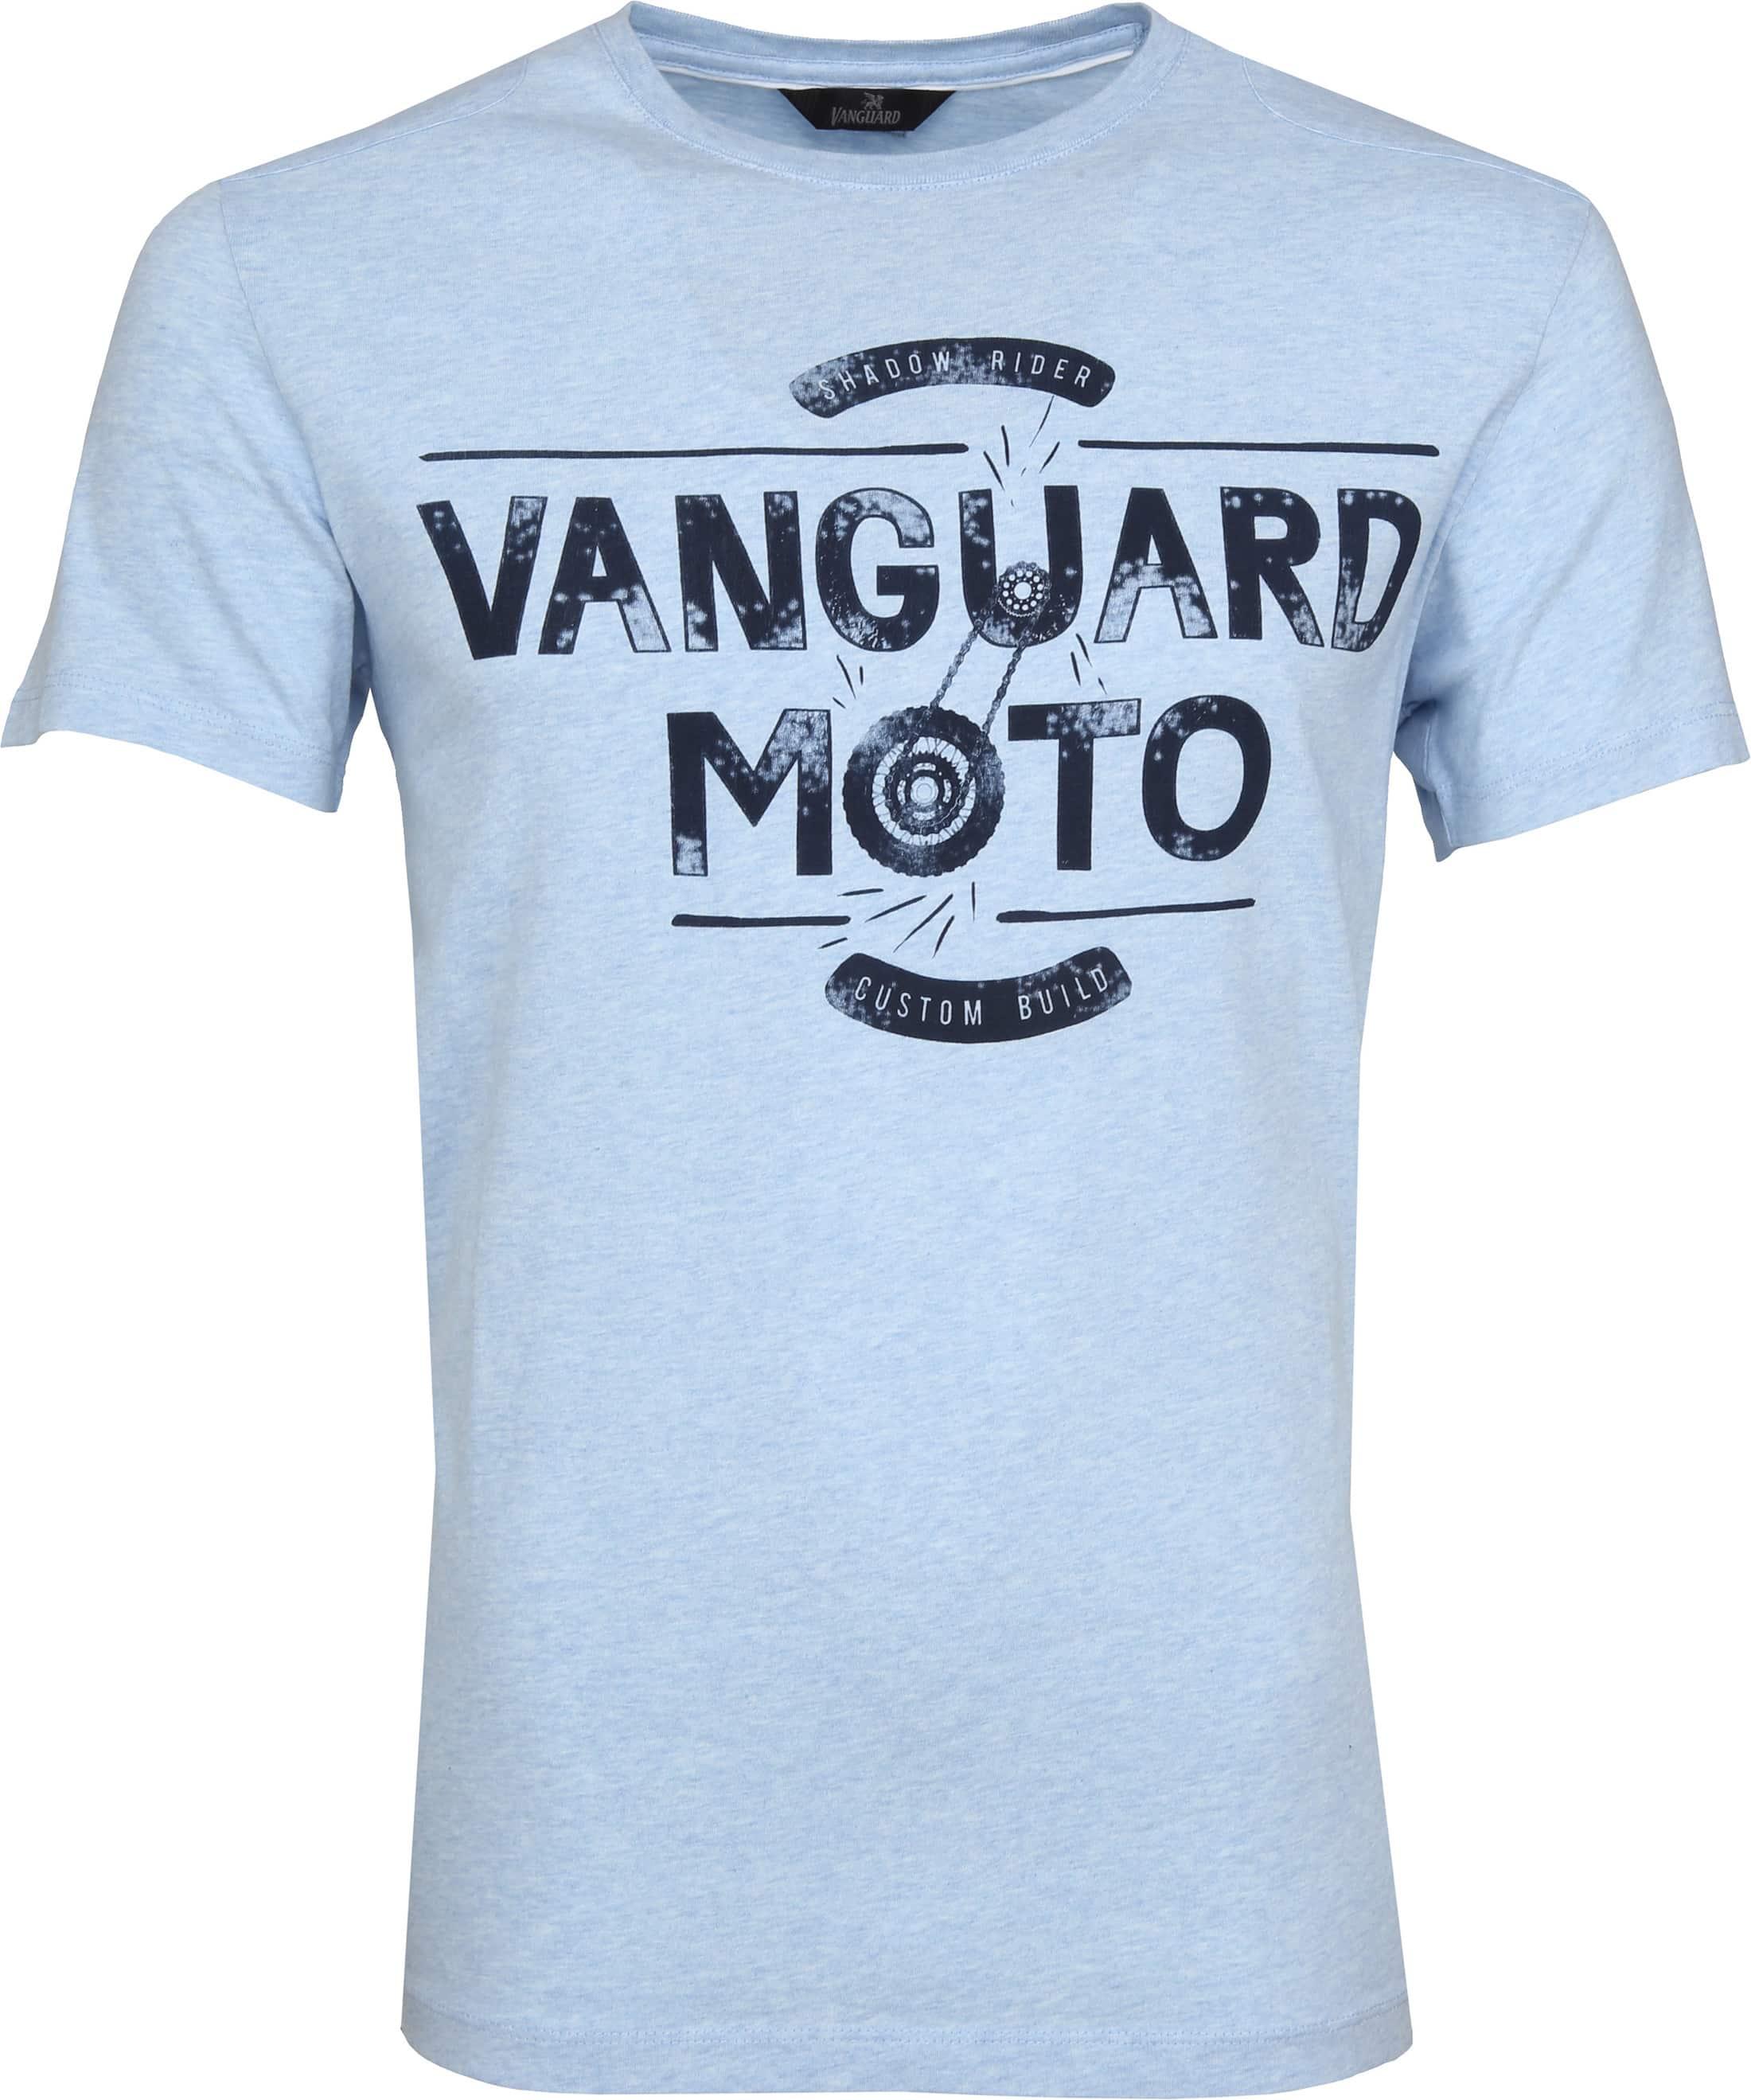 Vanguard T-shirt Lichtblauw Print foto 0